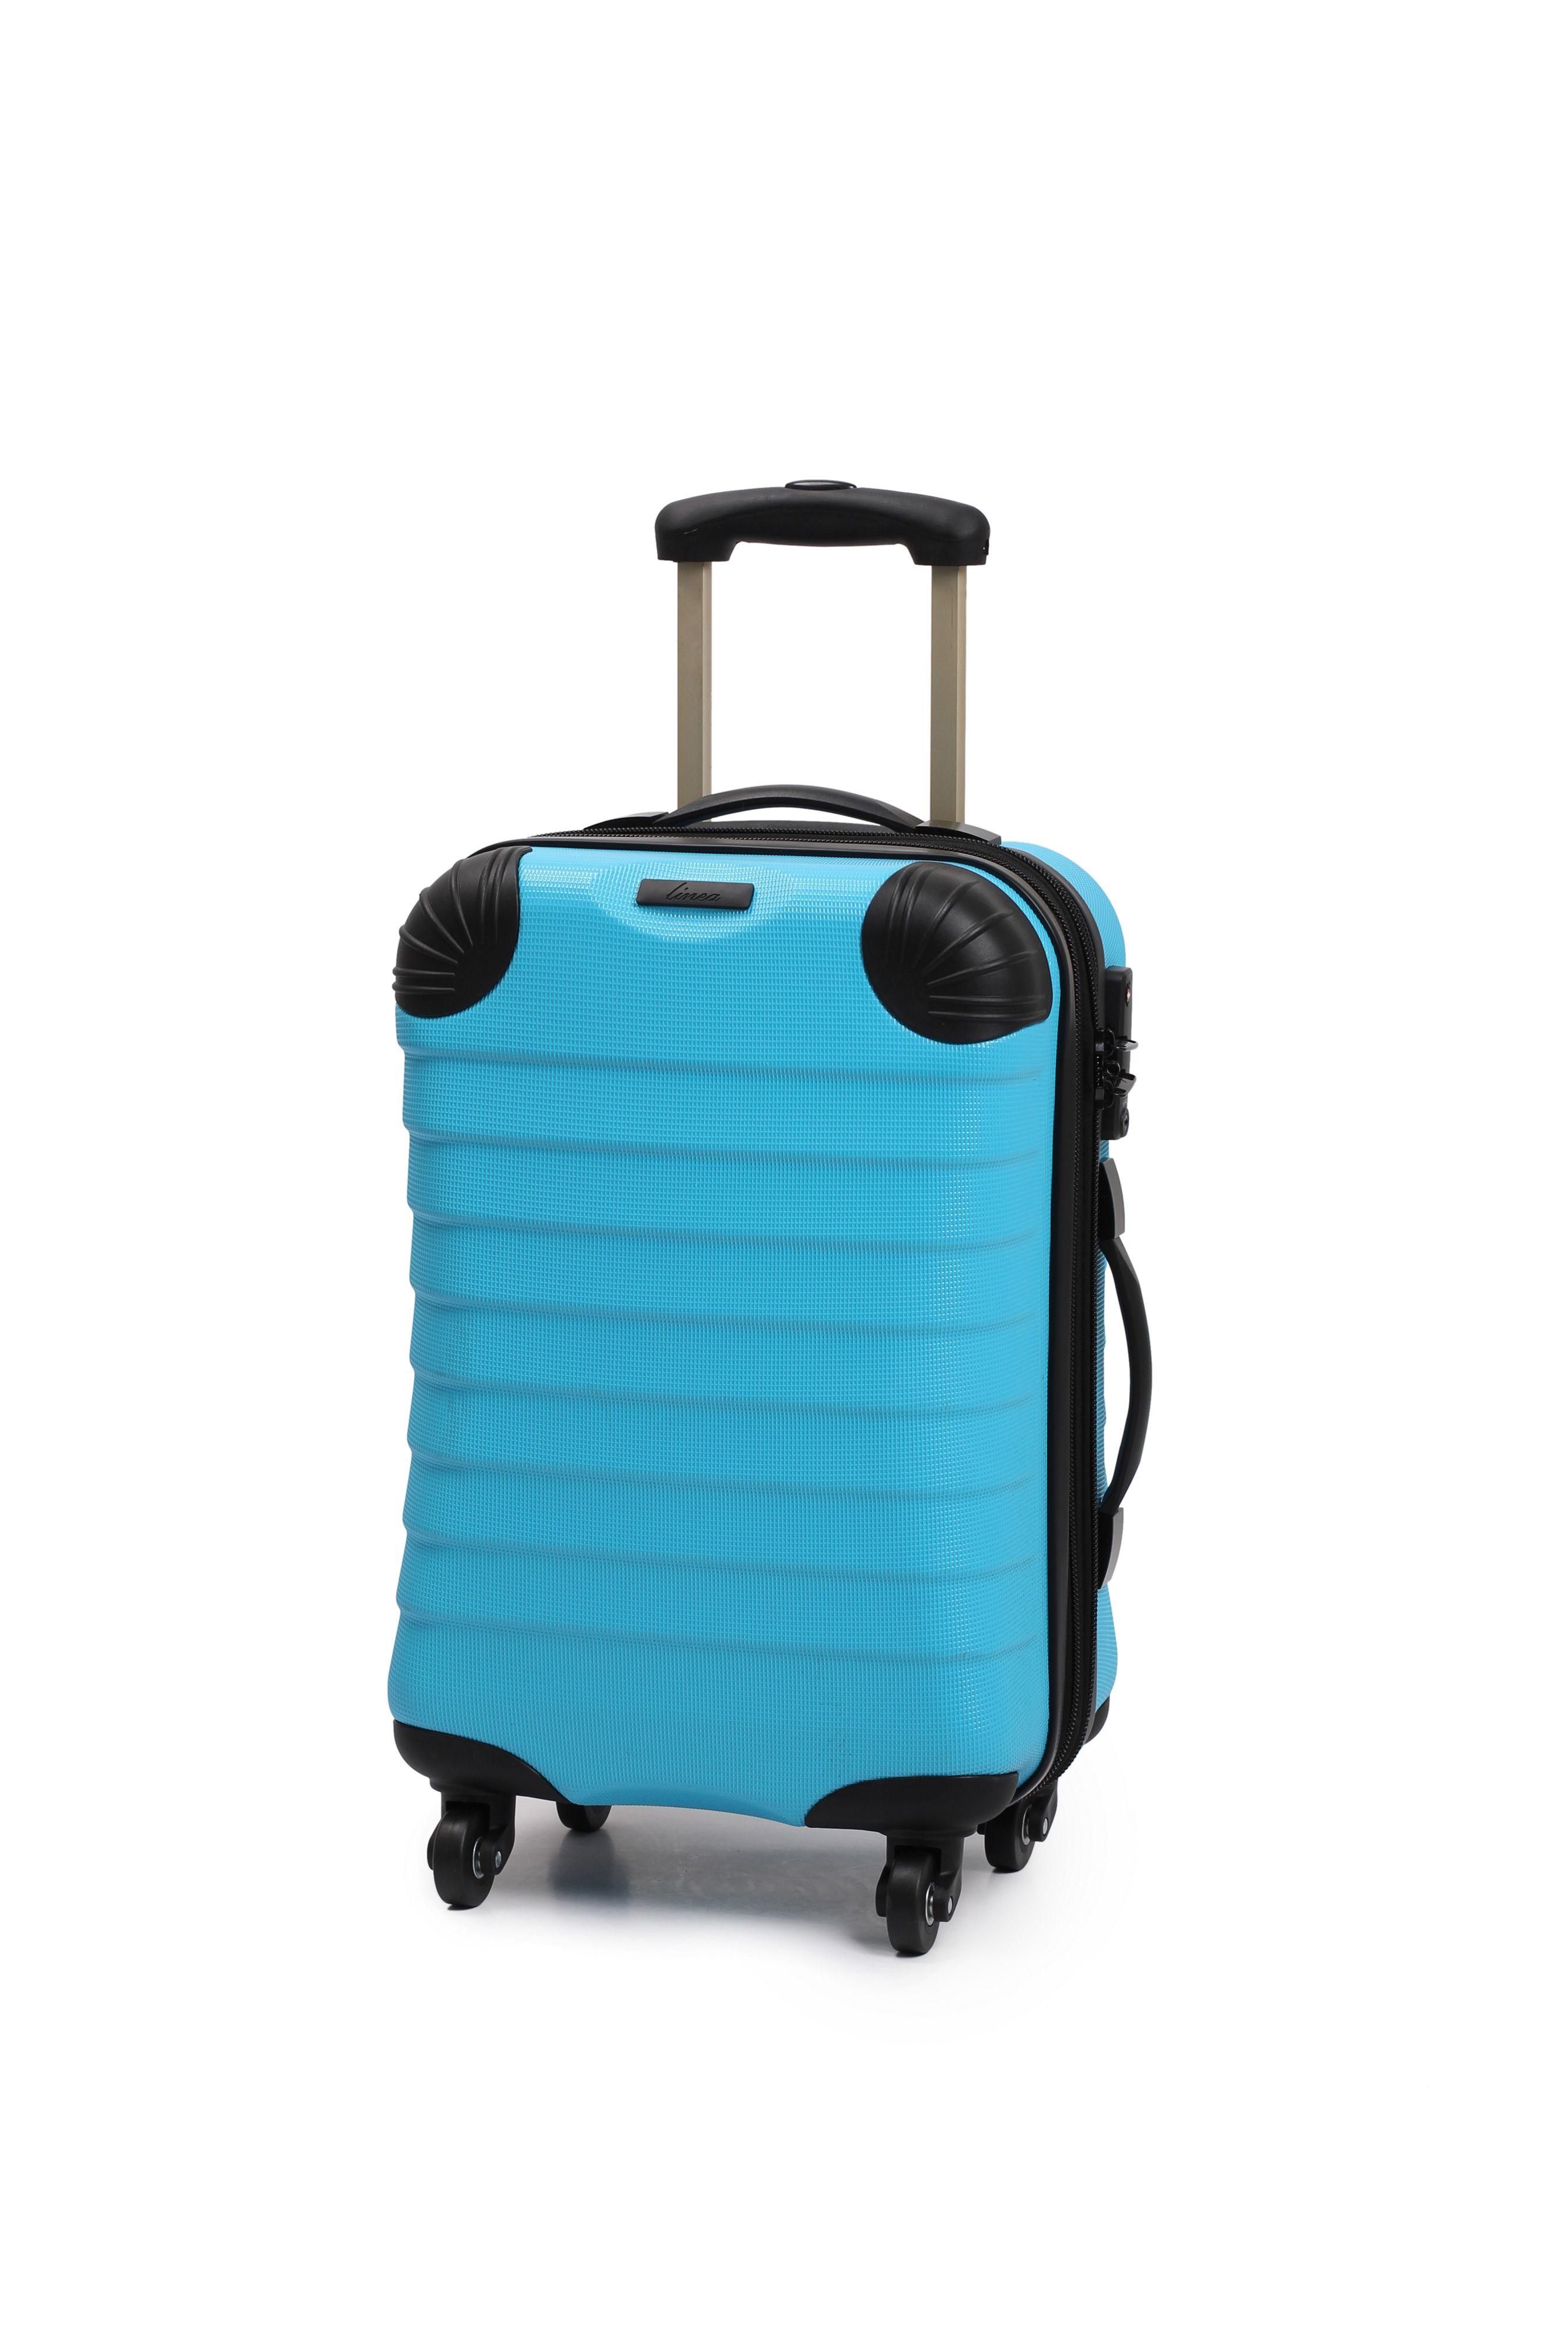 Linea Shell Aqua 4 Wheel Hard Cabin Suitcase In Blue For